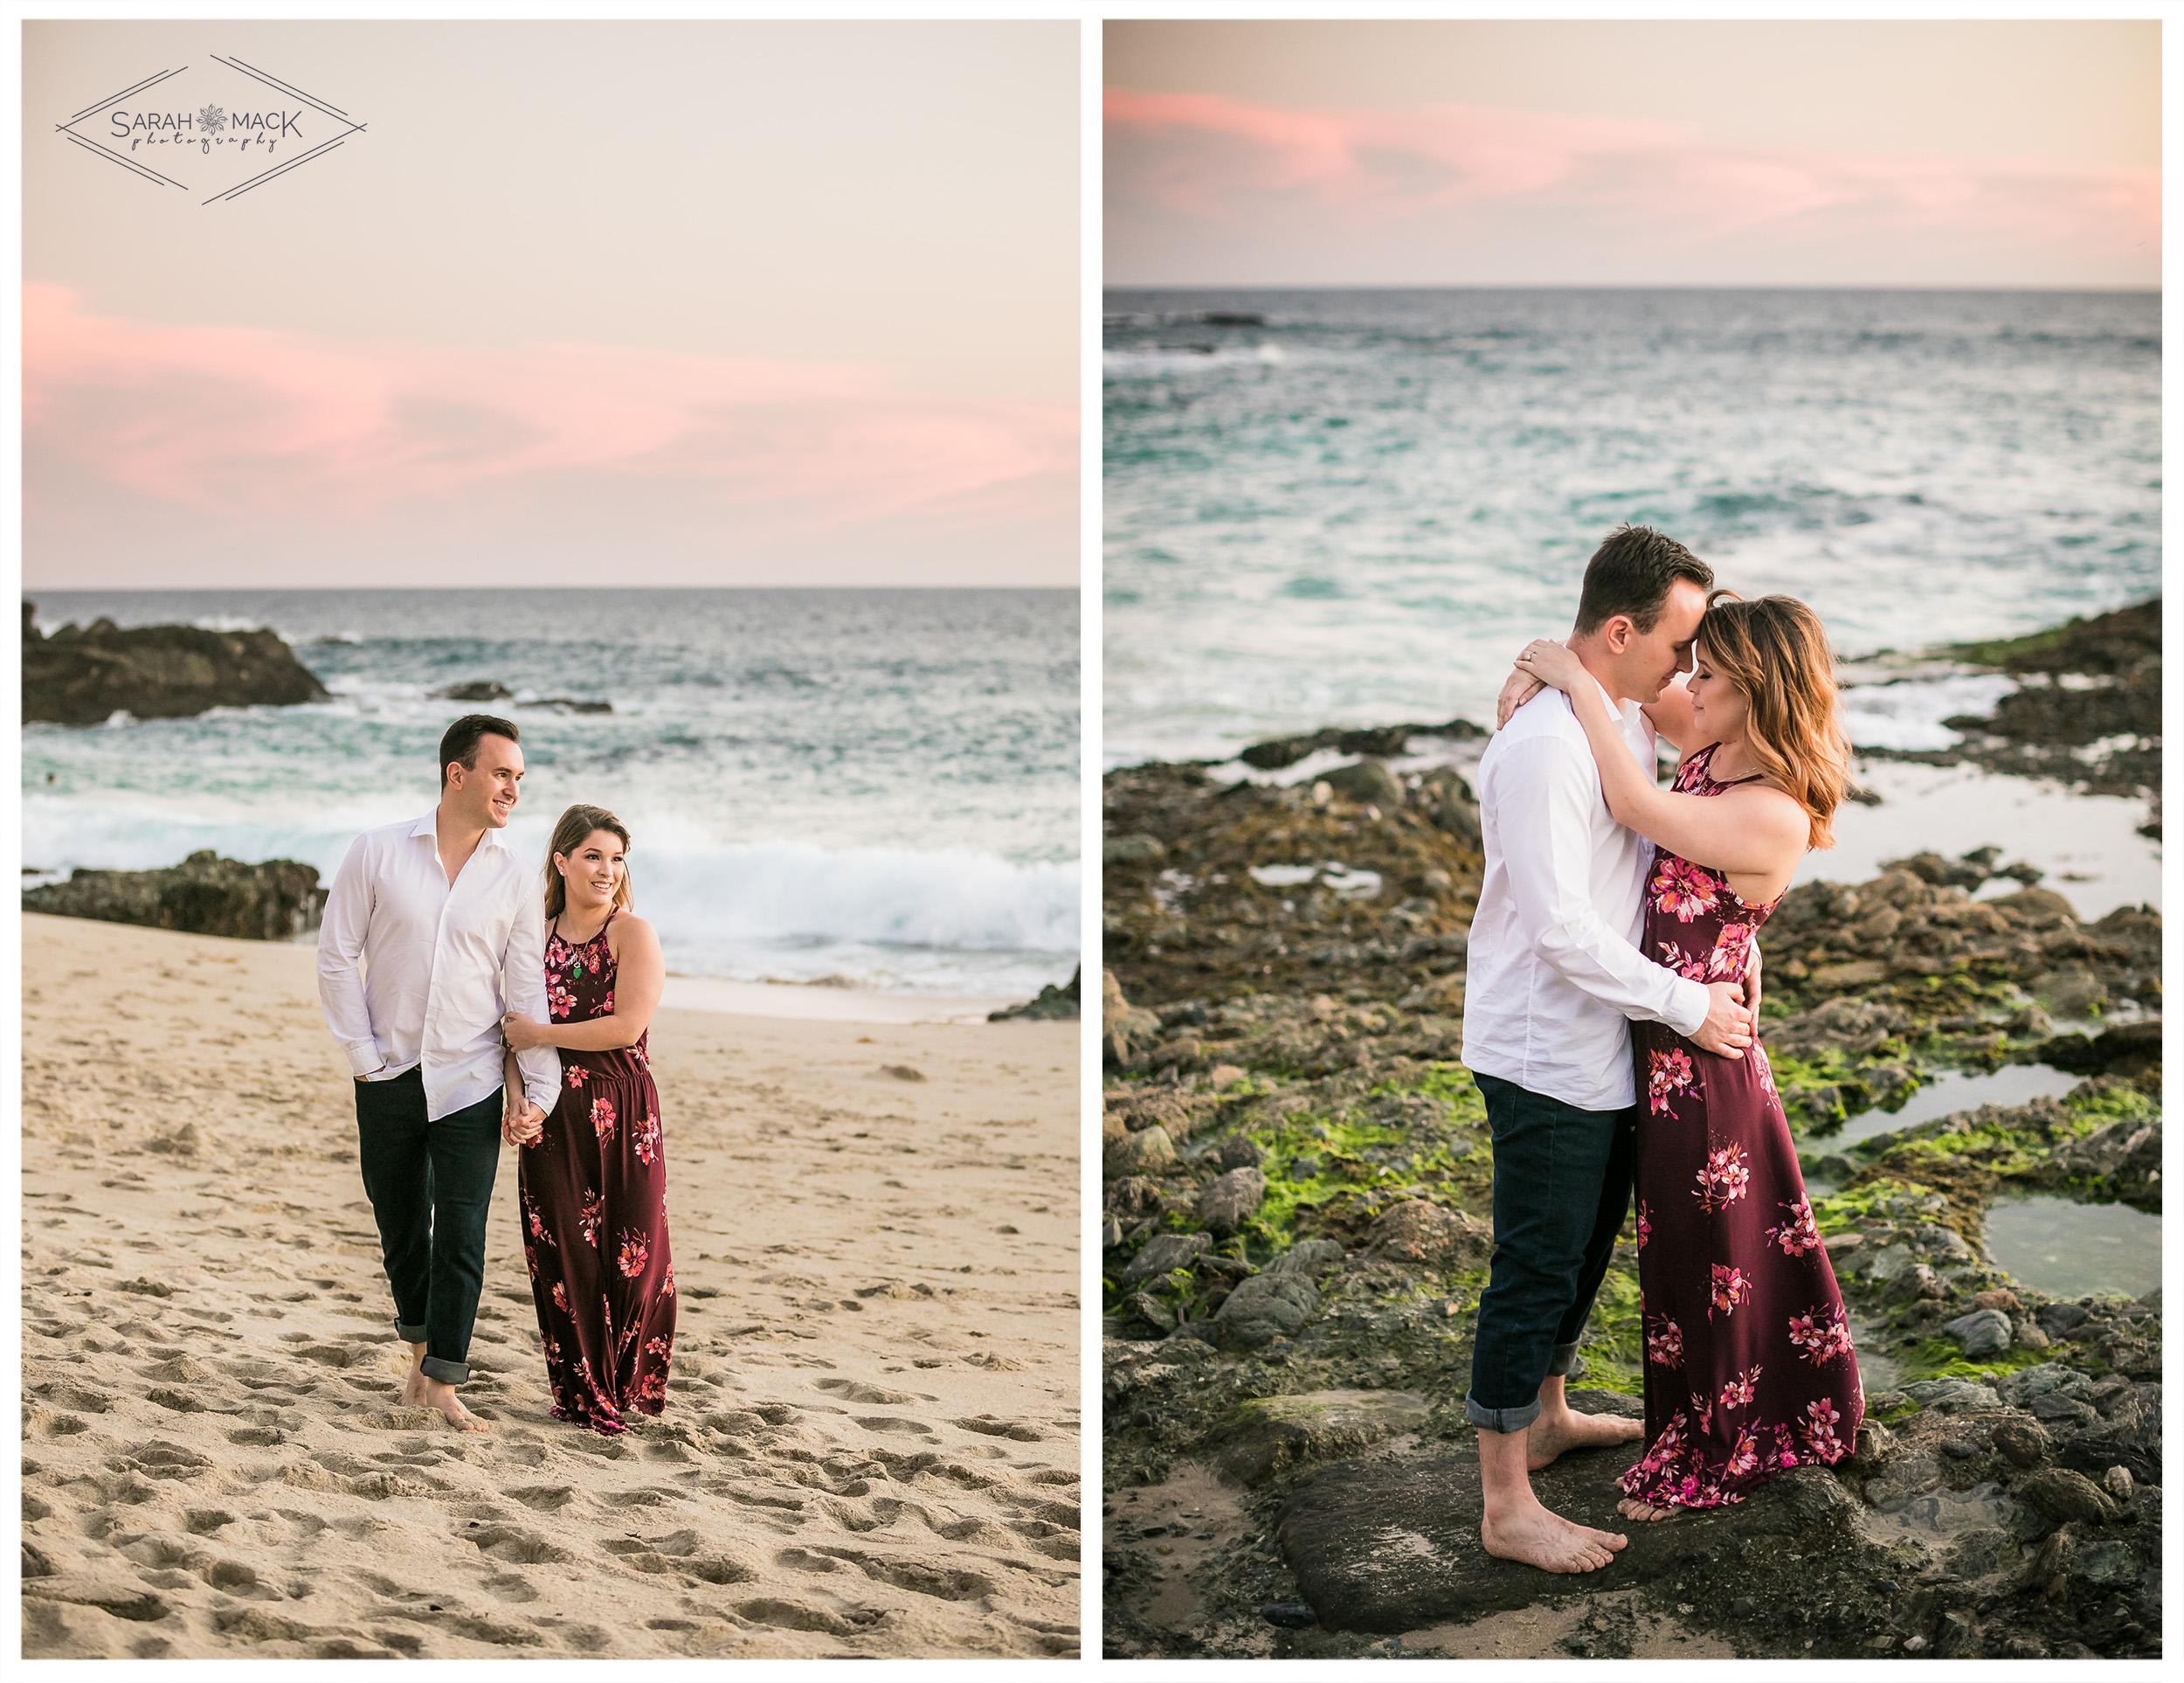 LN-Table-Rock-Beach-Laguna-Engagement-Photography-18.jpg